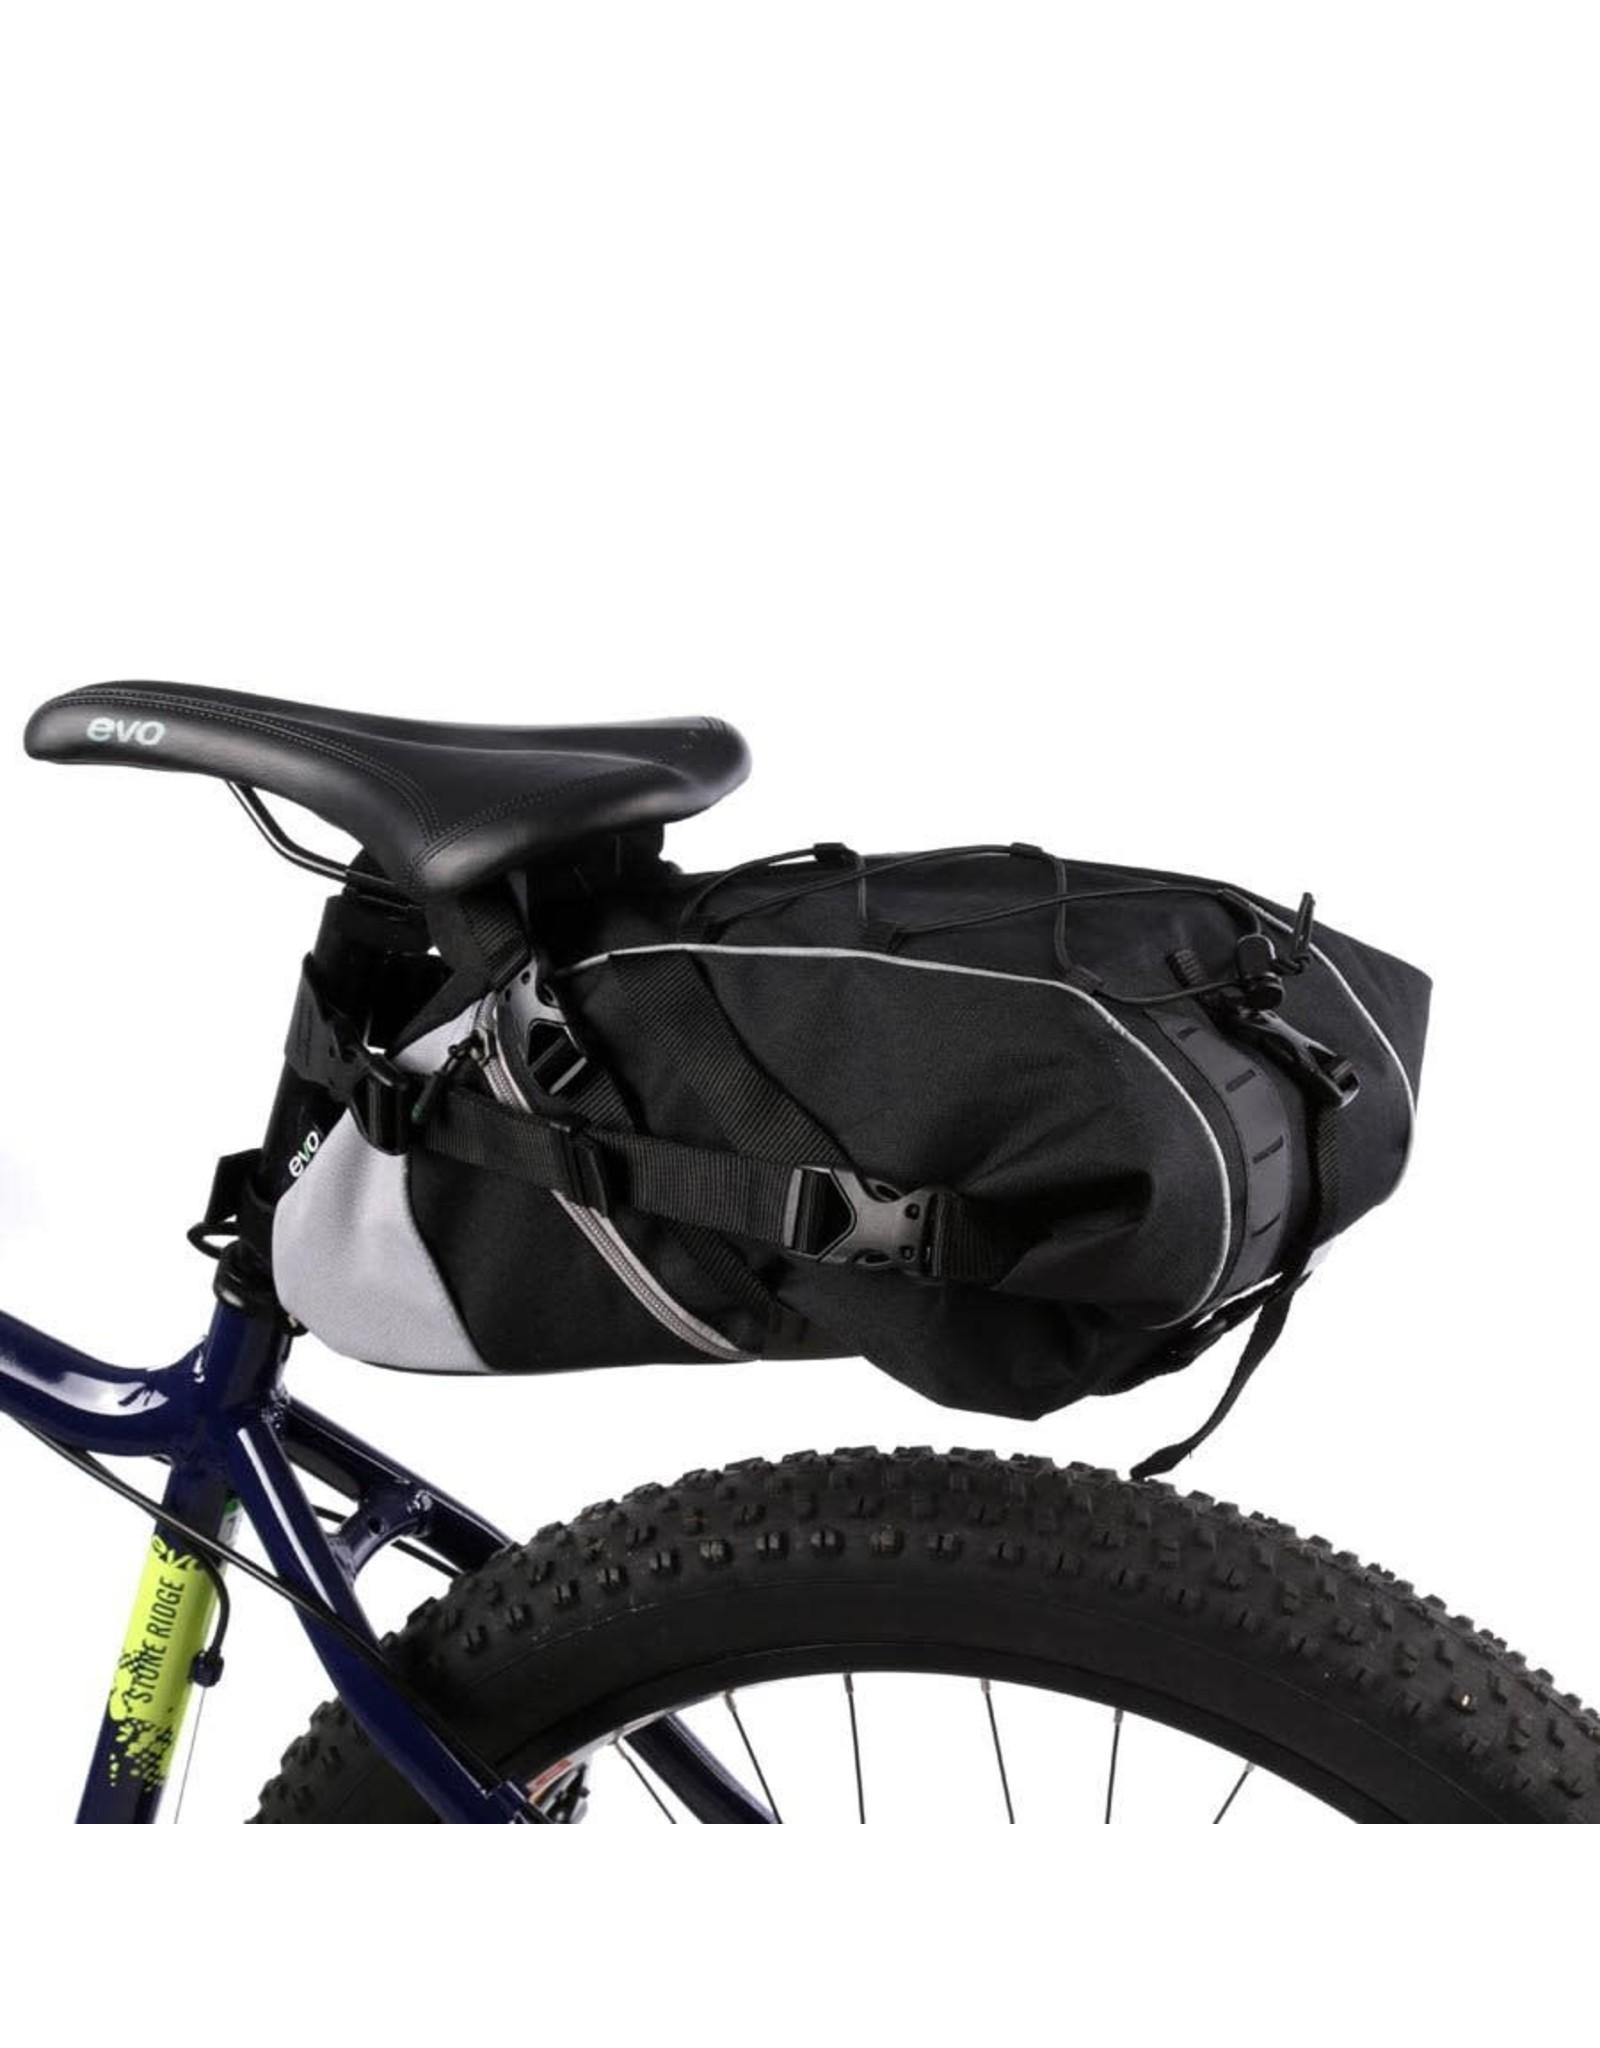 EVO Evo Clutch Adventure Bag